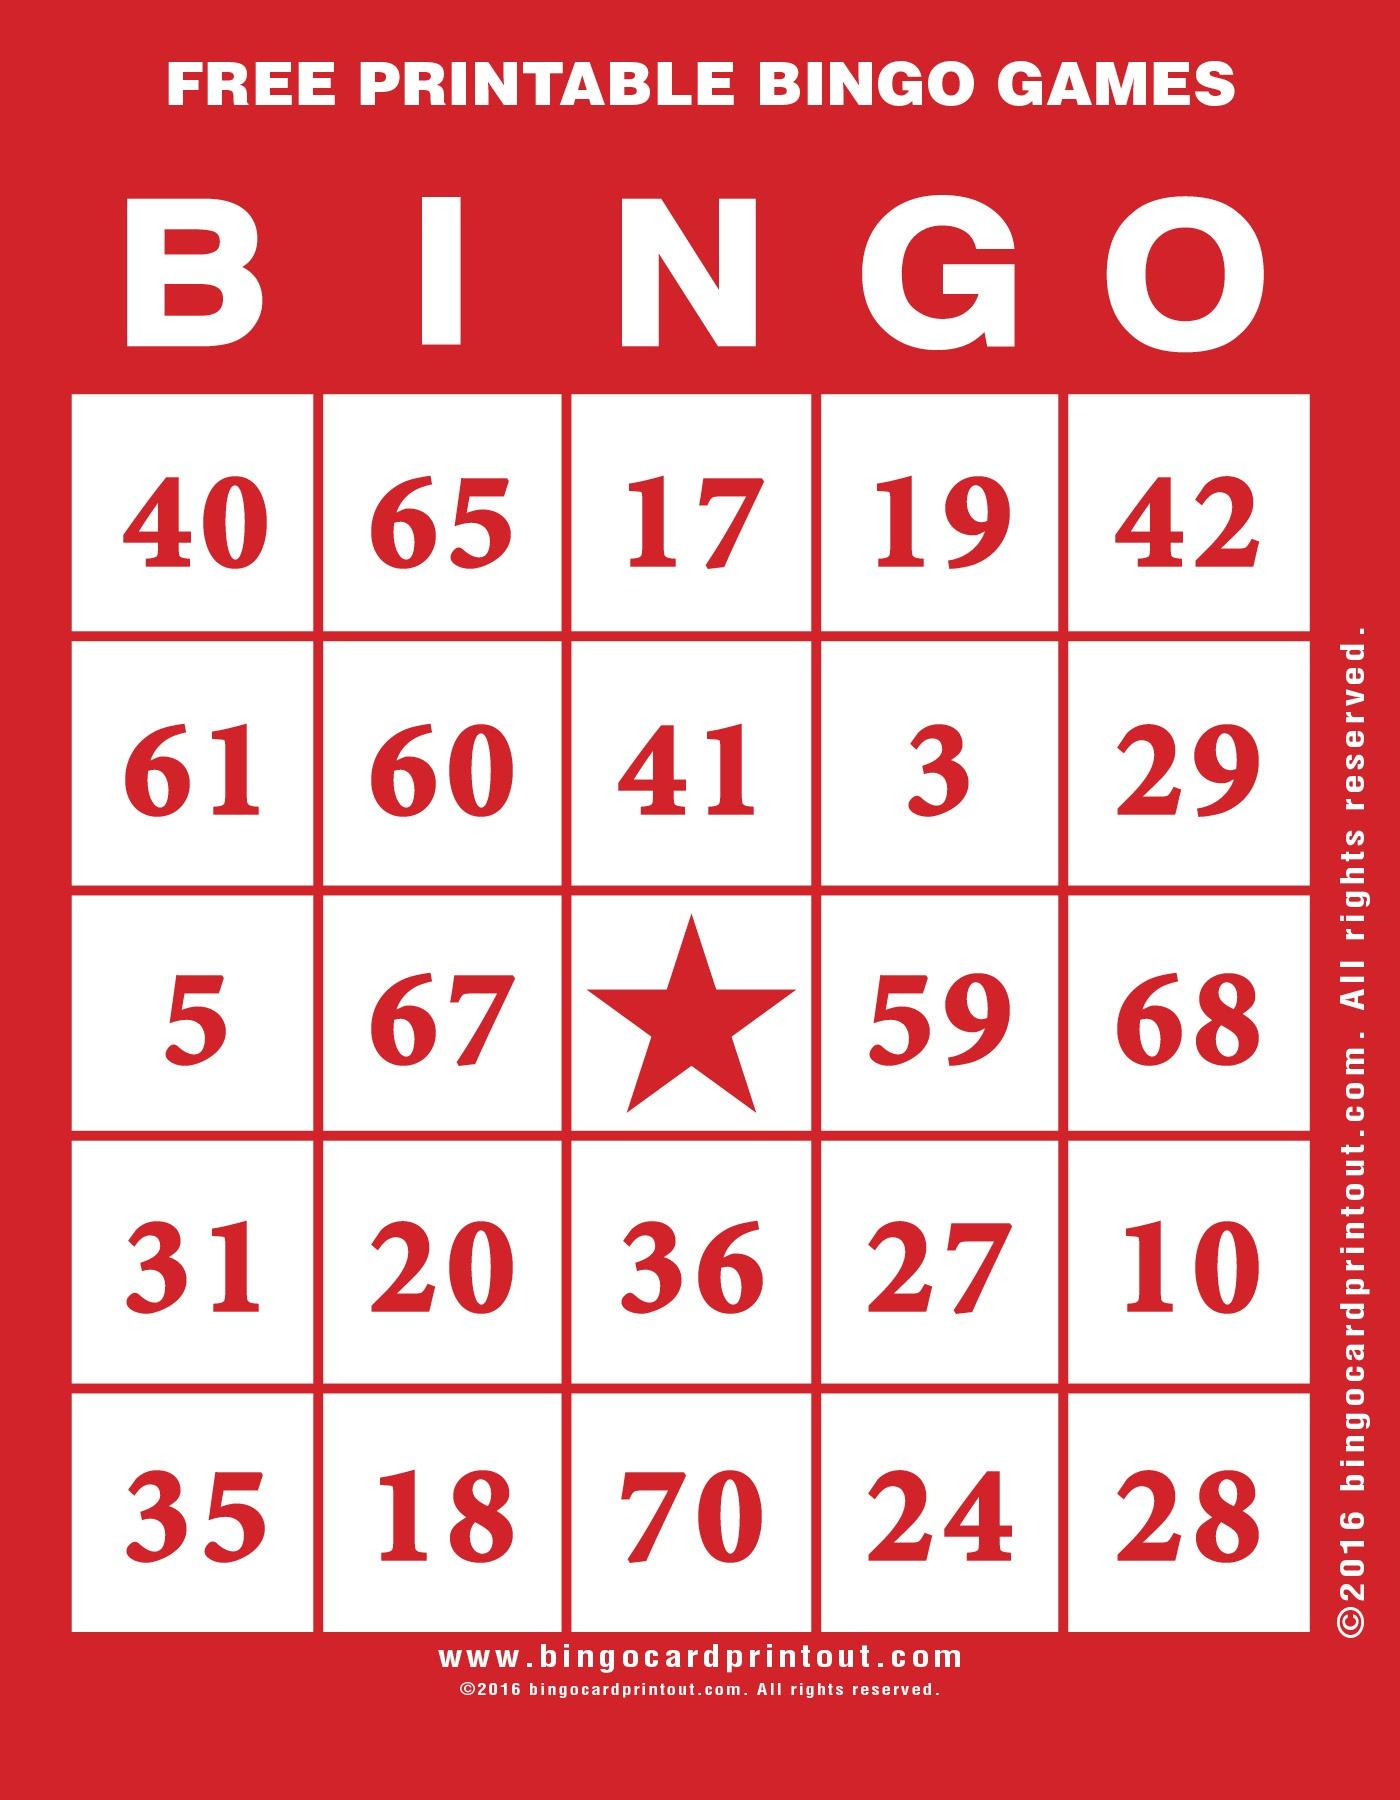 Free Printable Bingo Games - Bingocardprintout - Free Printable Bingo Games